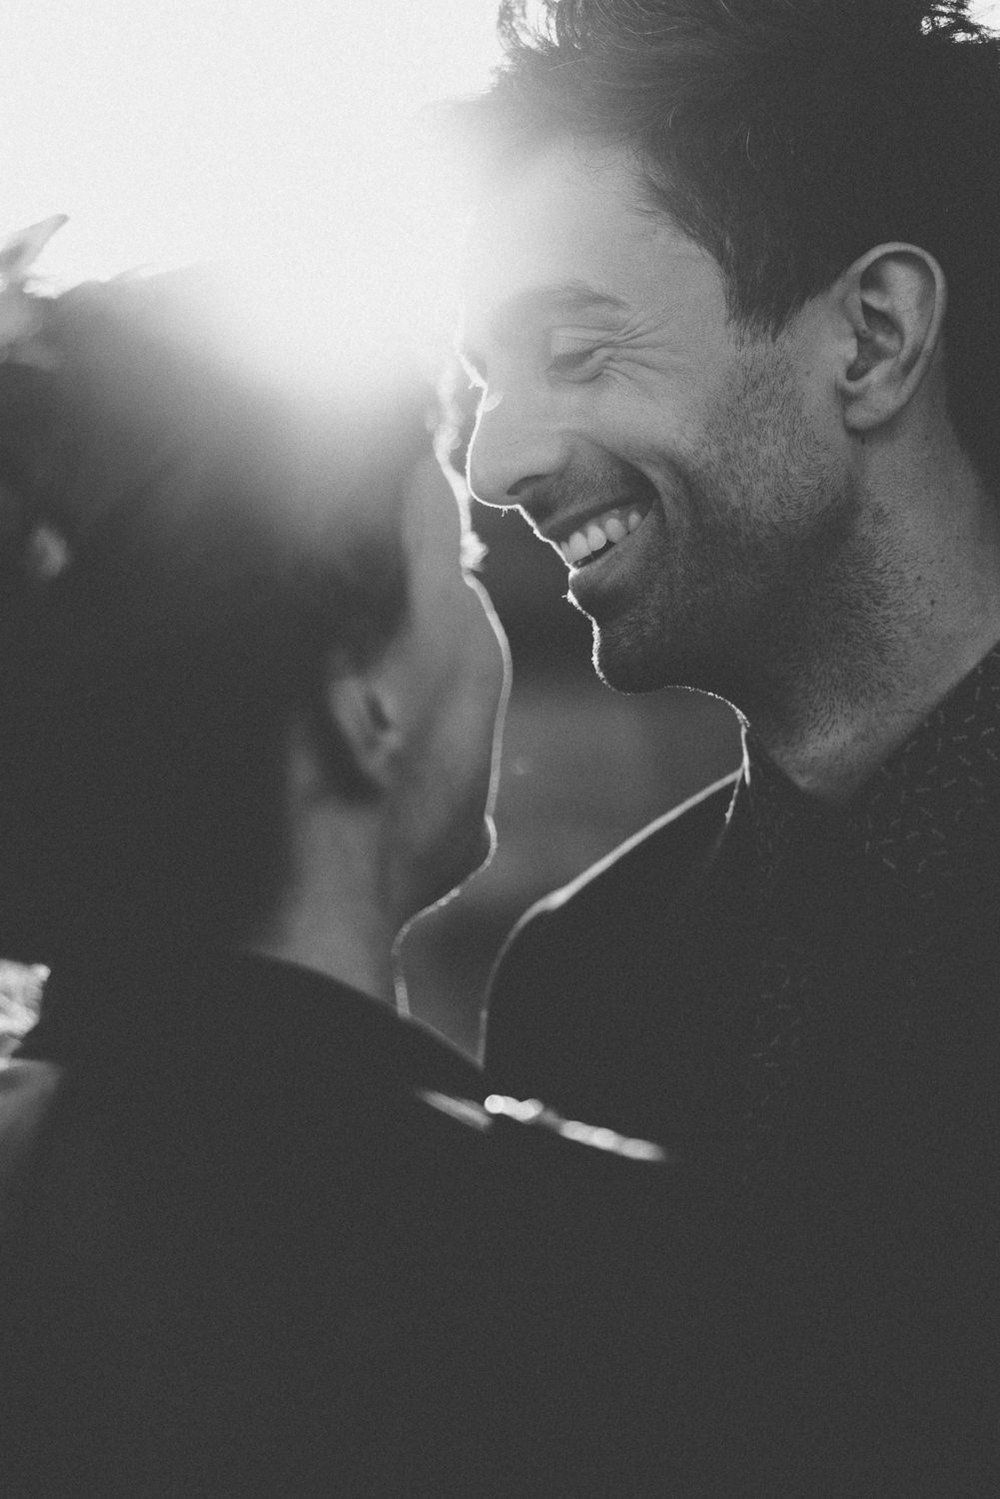 bruidsfotografie-amsterdam-utrecht-trouwfotograaf-mark-hadden-wedding-photography-Cathrin-Michael-435-2.jpg